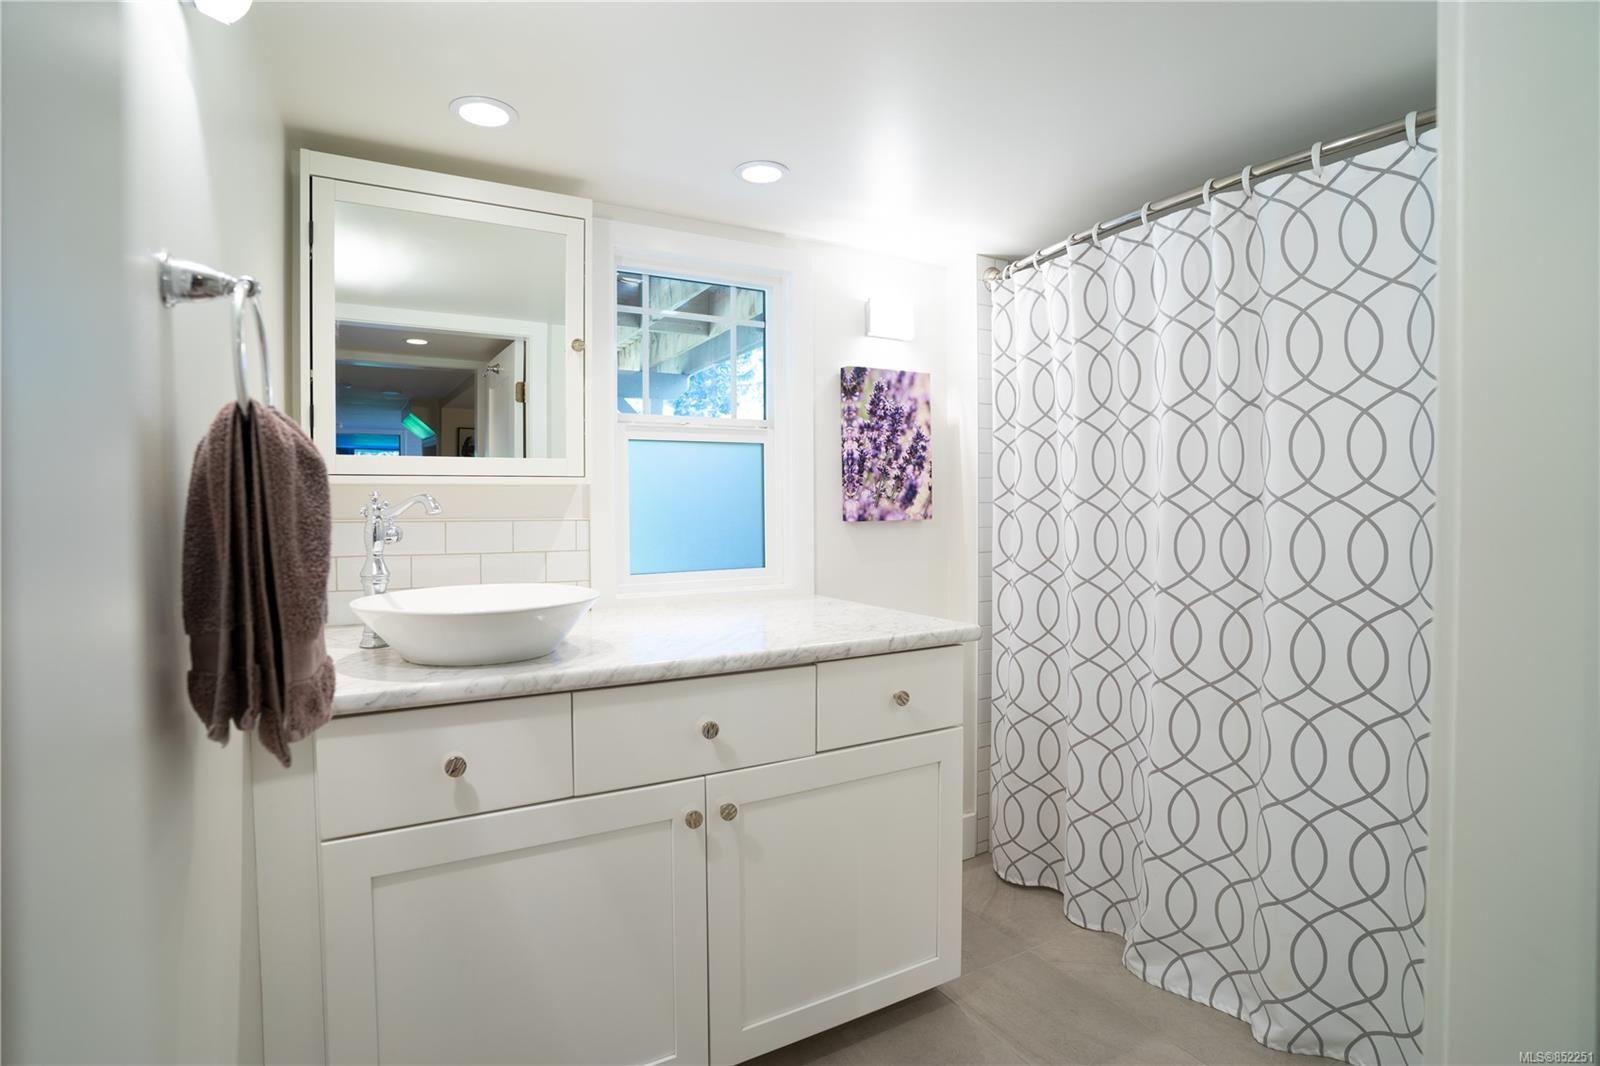 Photo 25: Photos: 2363 Pacific Ave in : OB Estevan House for sale (Oak Bay)  : MLS®# 852251